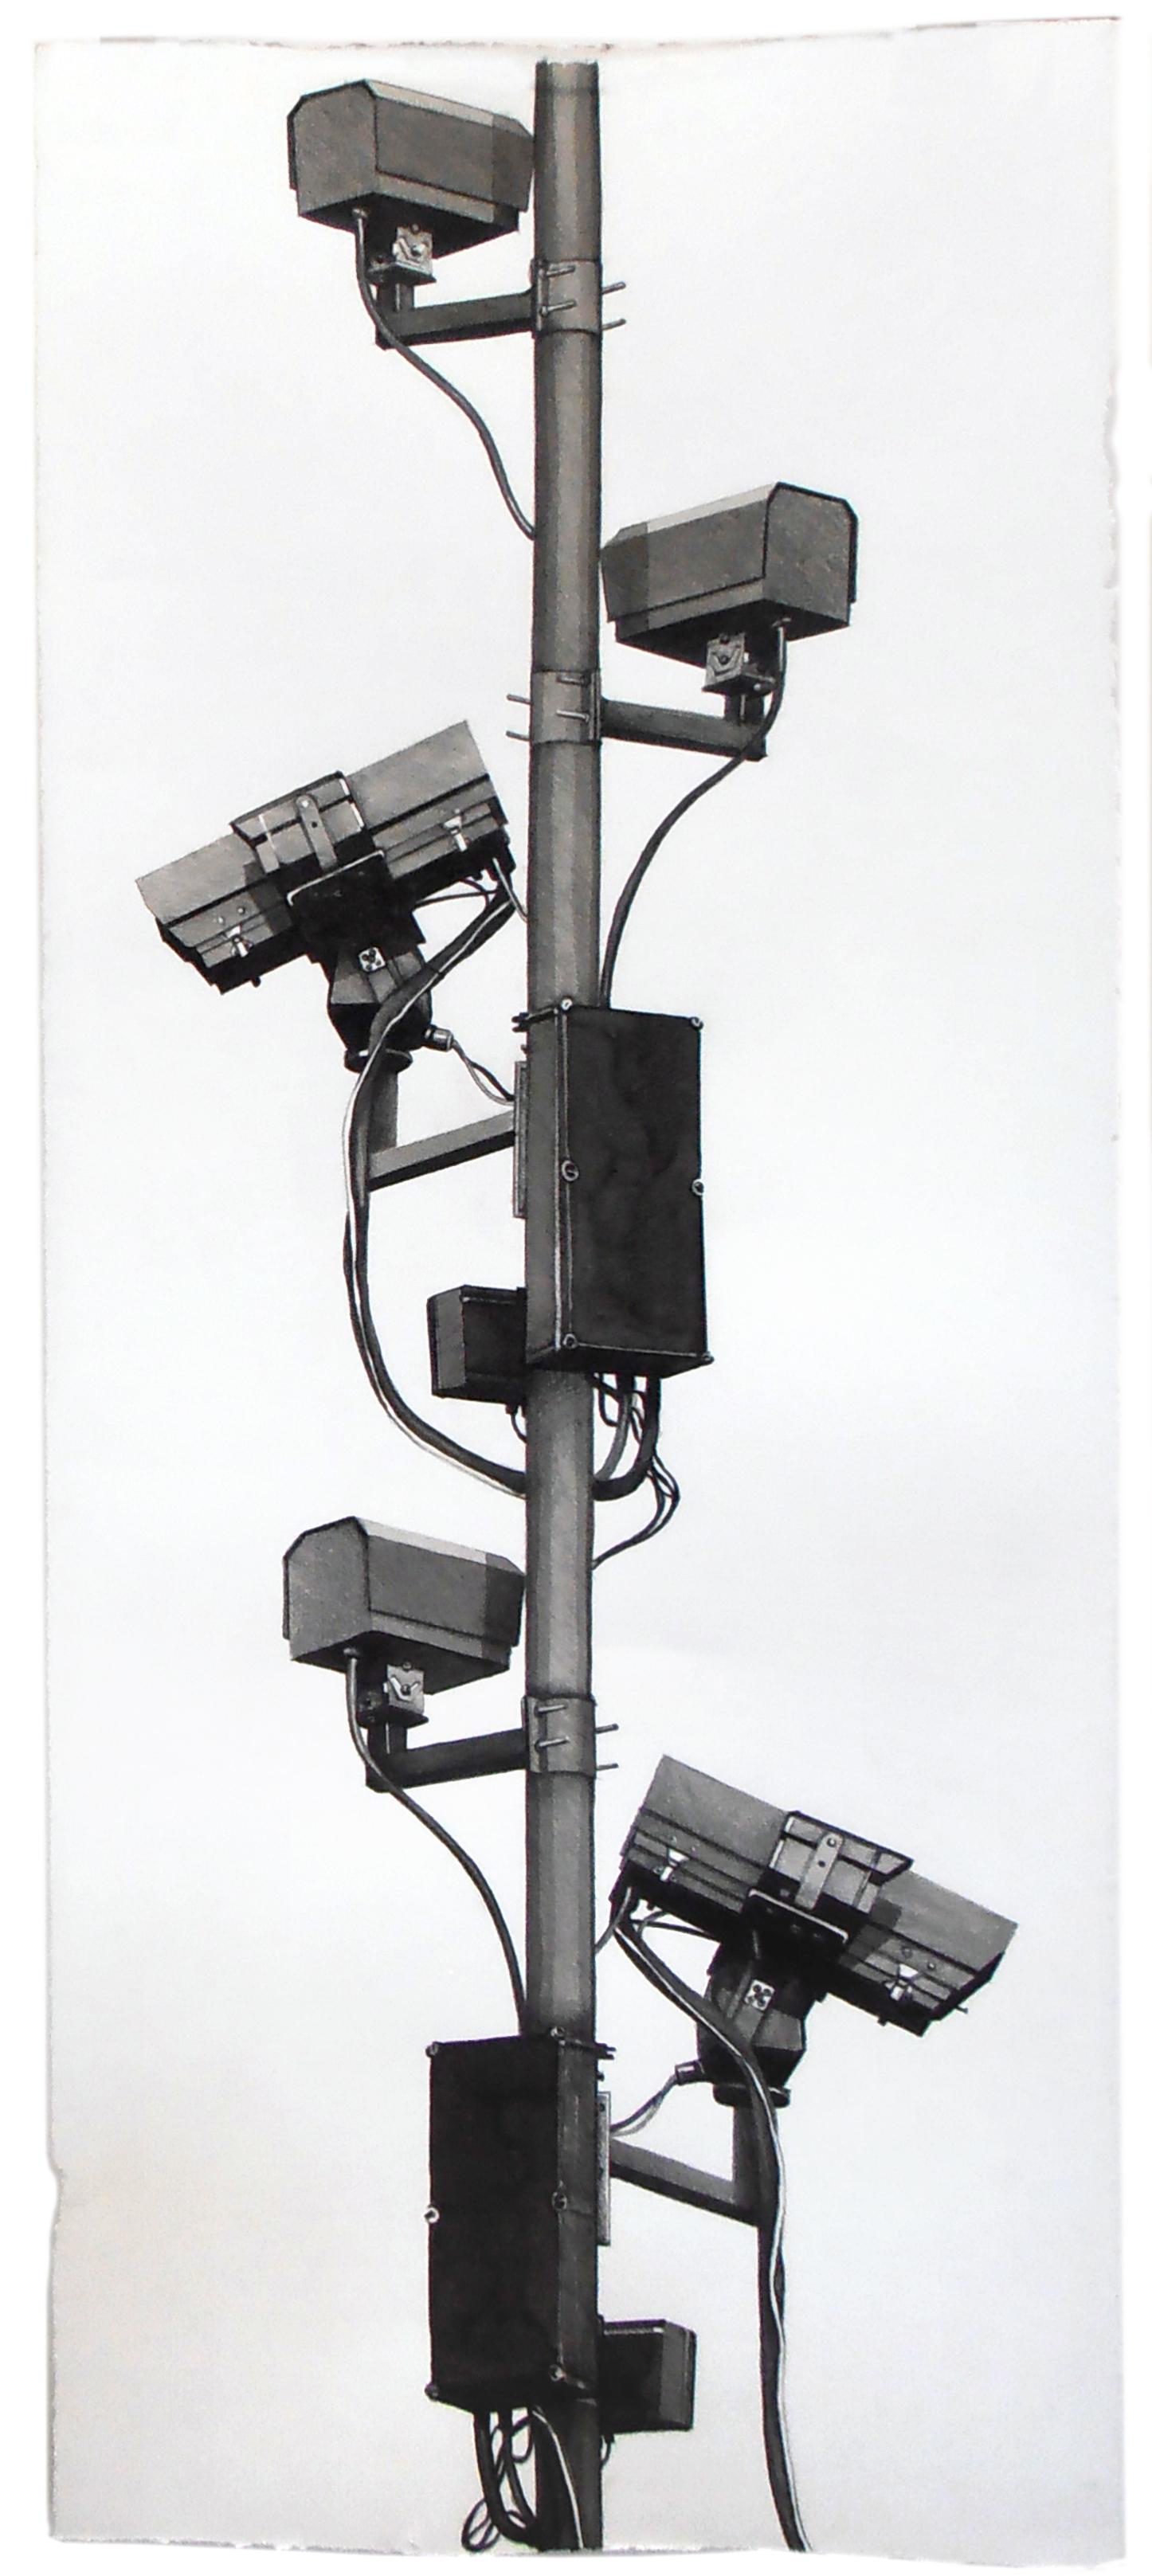 "CCTV, 36"" x 15"", 2014"